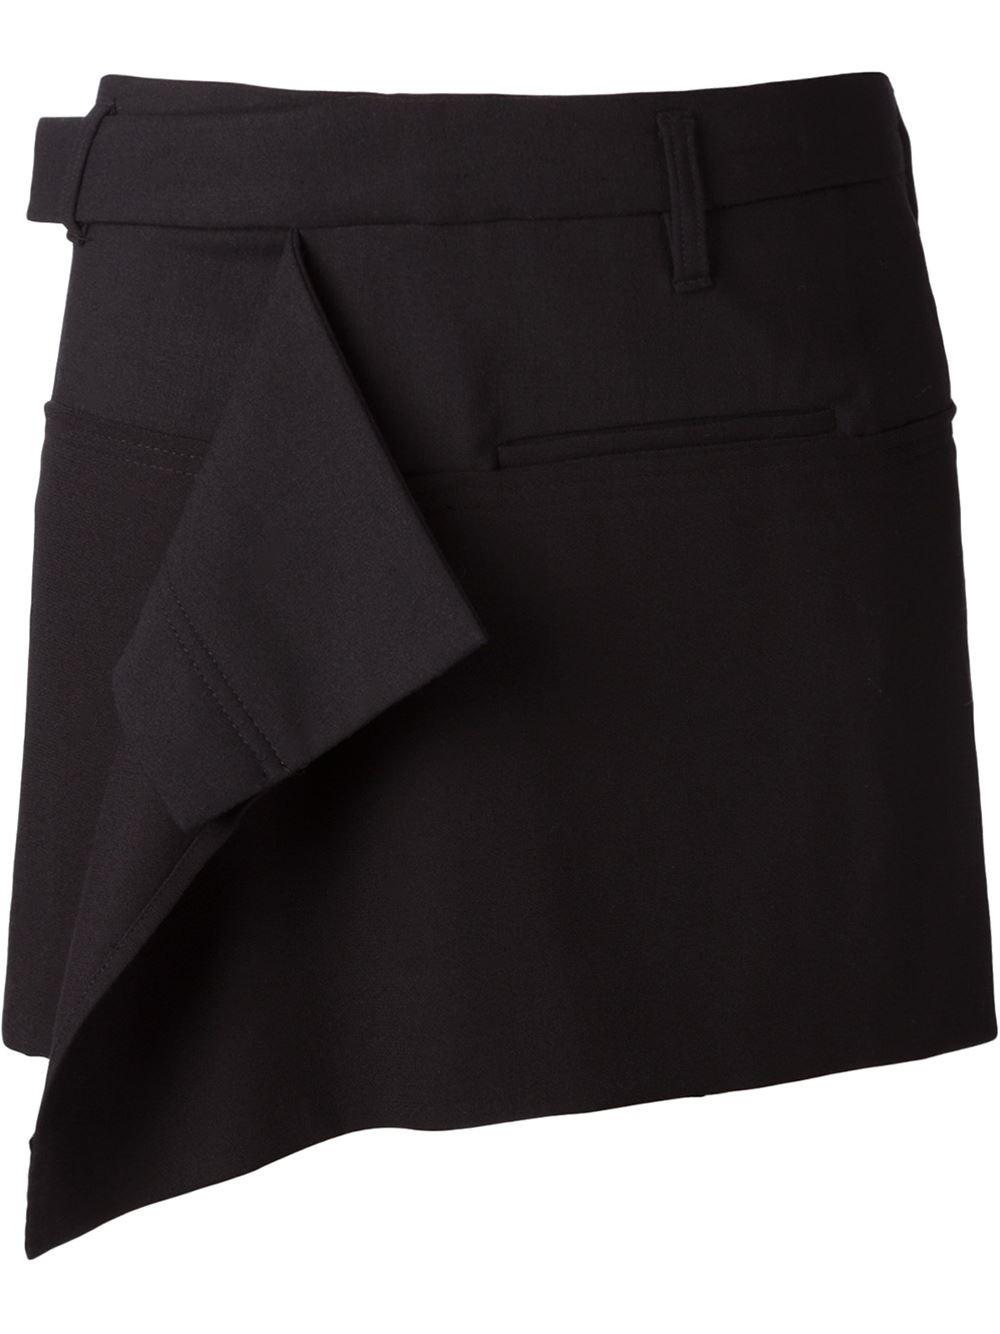 farfetch.com:shopping:women:haider-ackermann-distressed-wrap-skirt-item-11190666.aspx?storeid=9352&ffref=lp_pic_37_1_lst.jpg